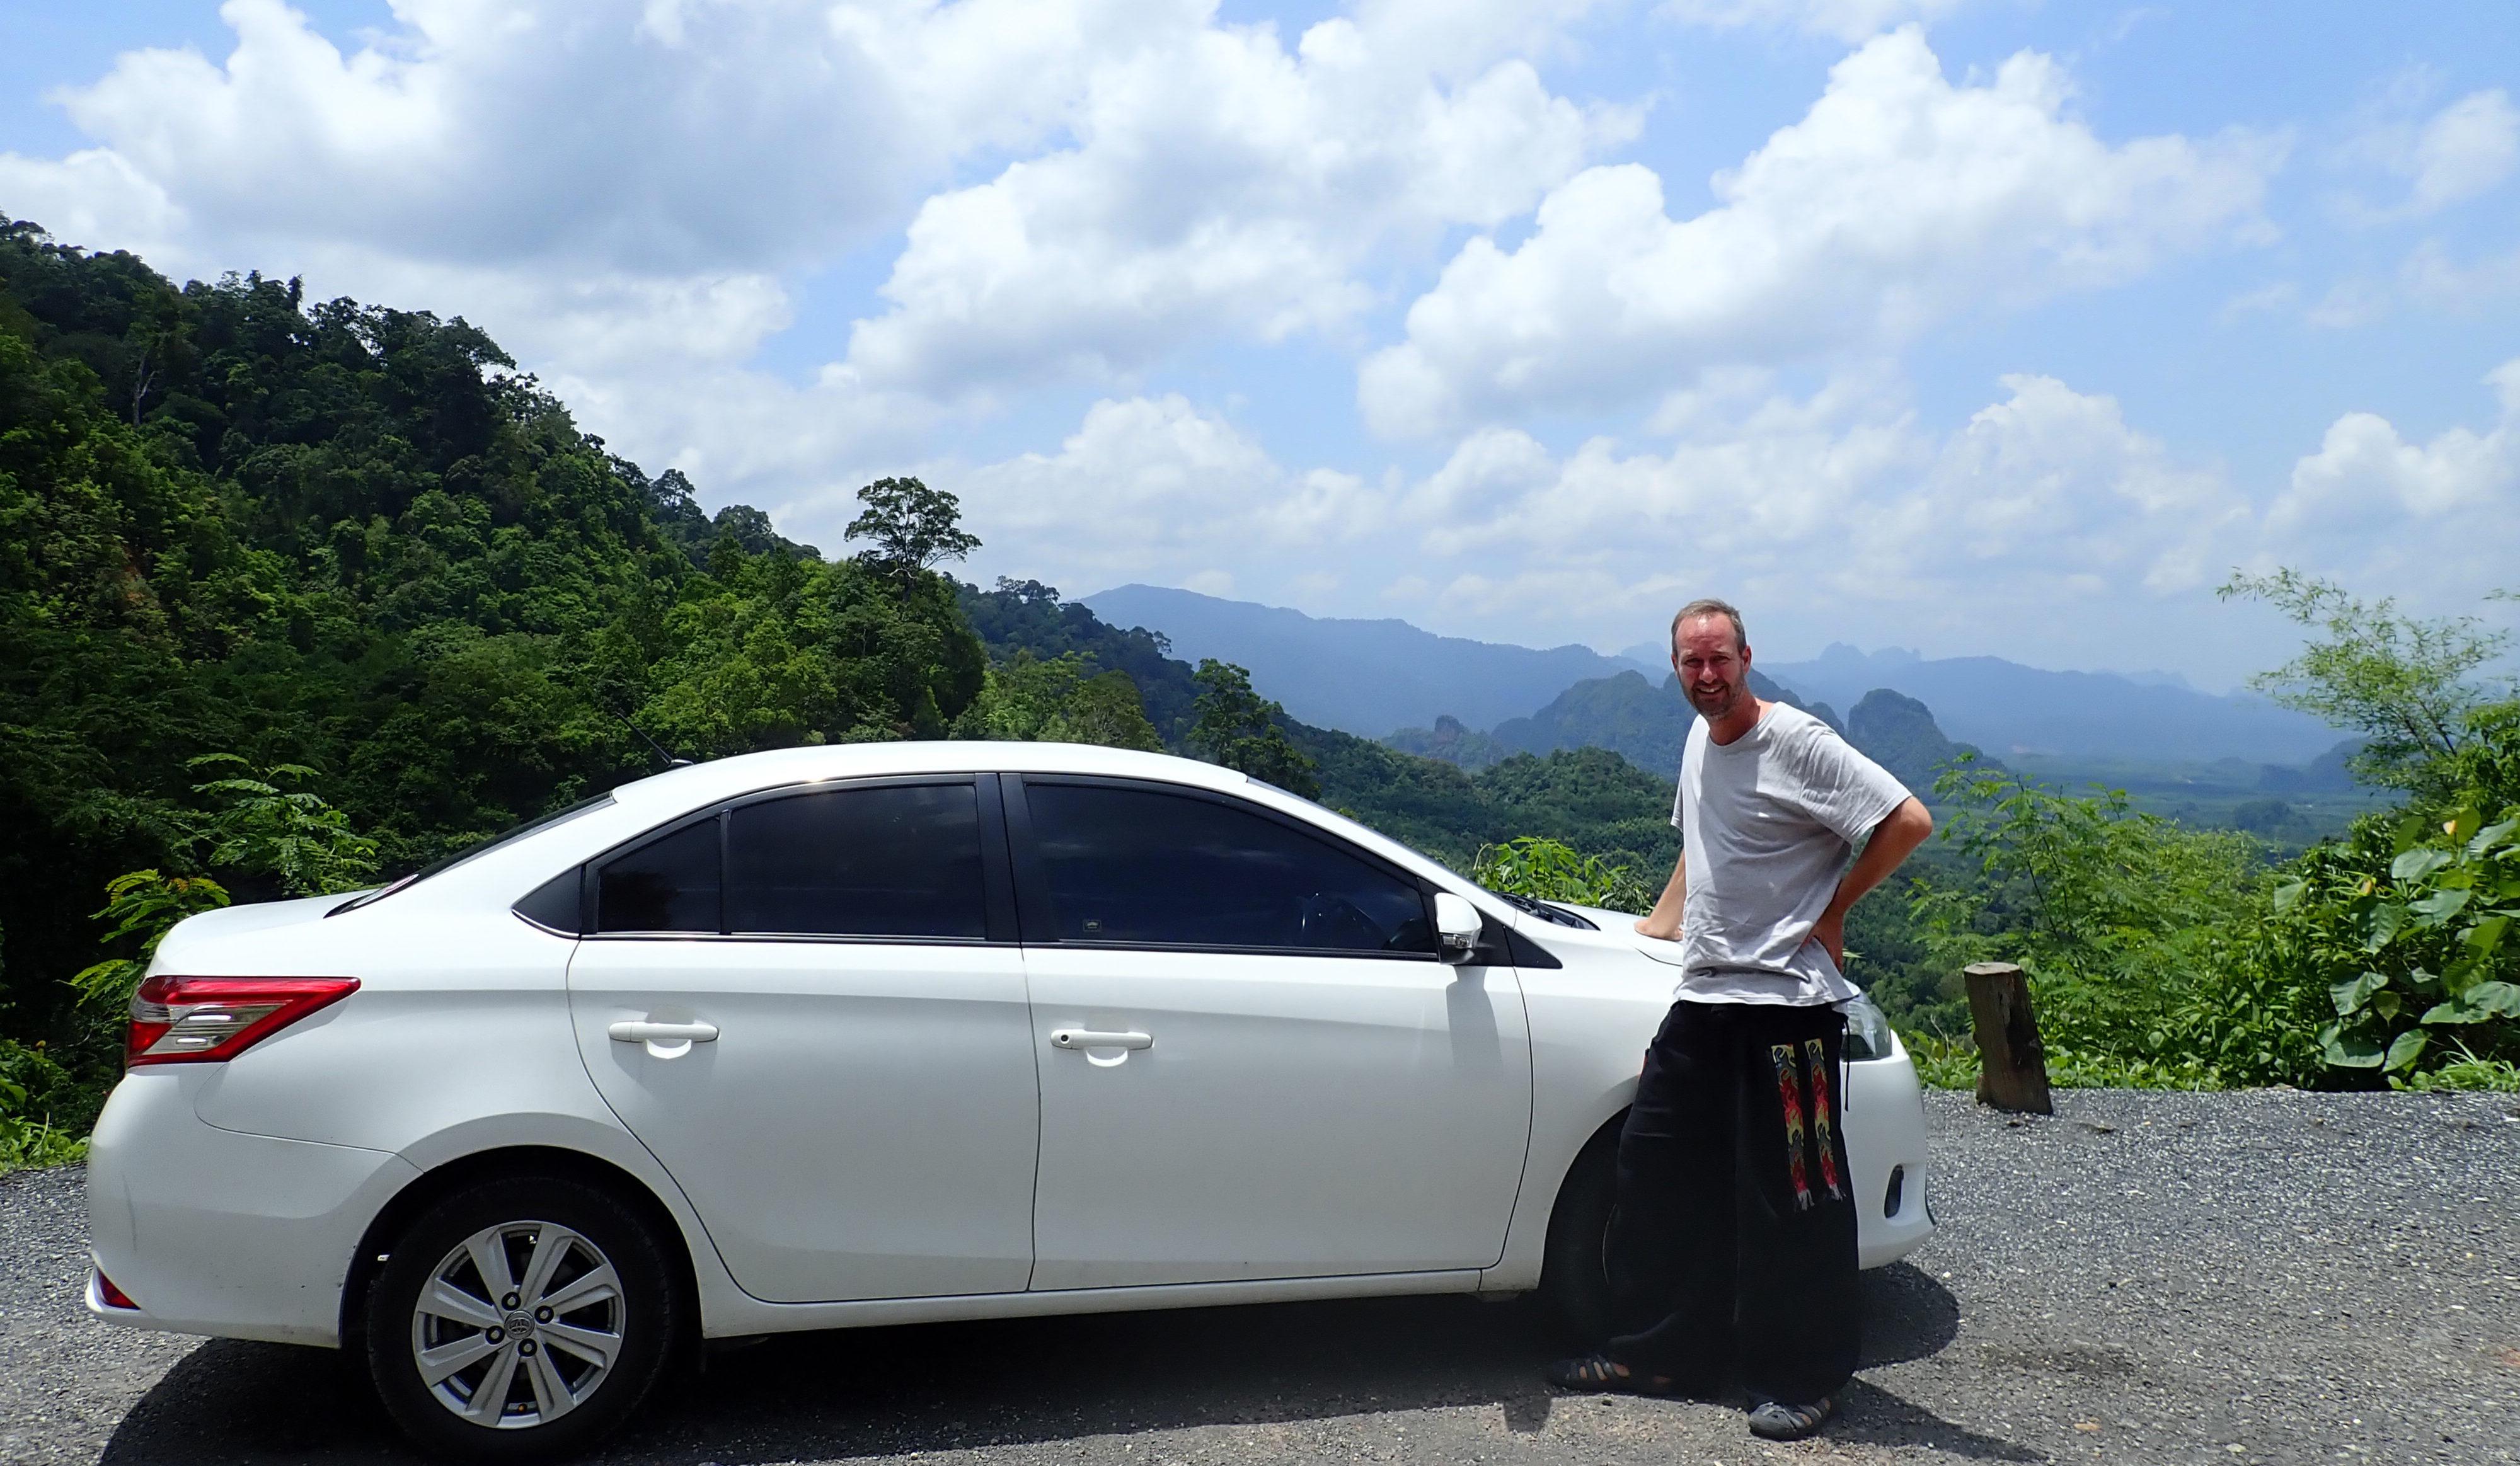 Having an Unforgettable Thailand Road Trip!